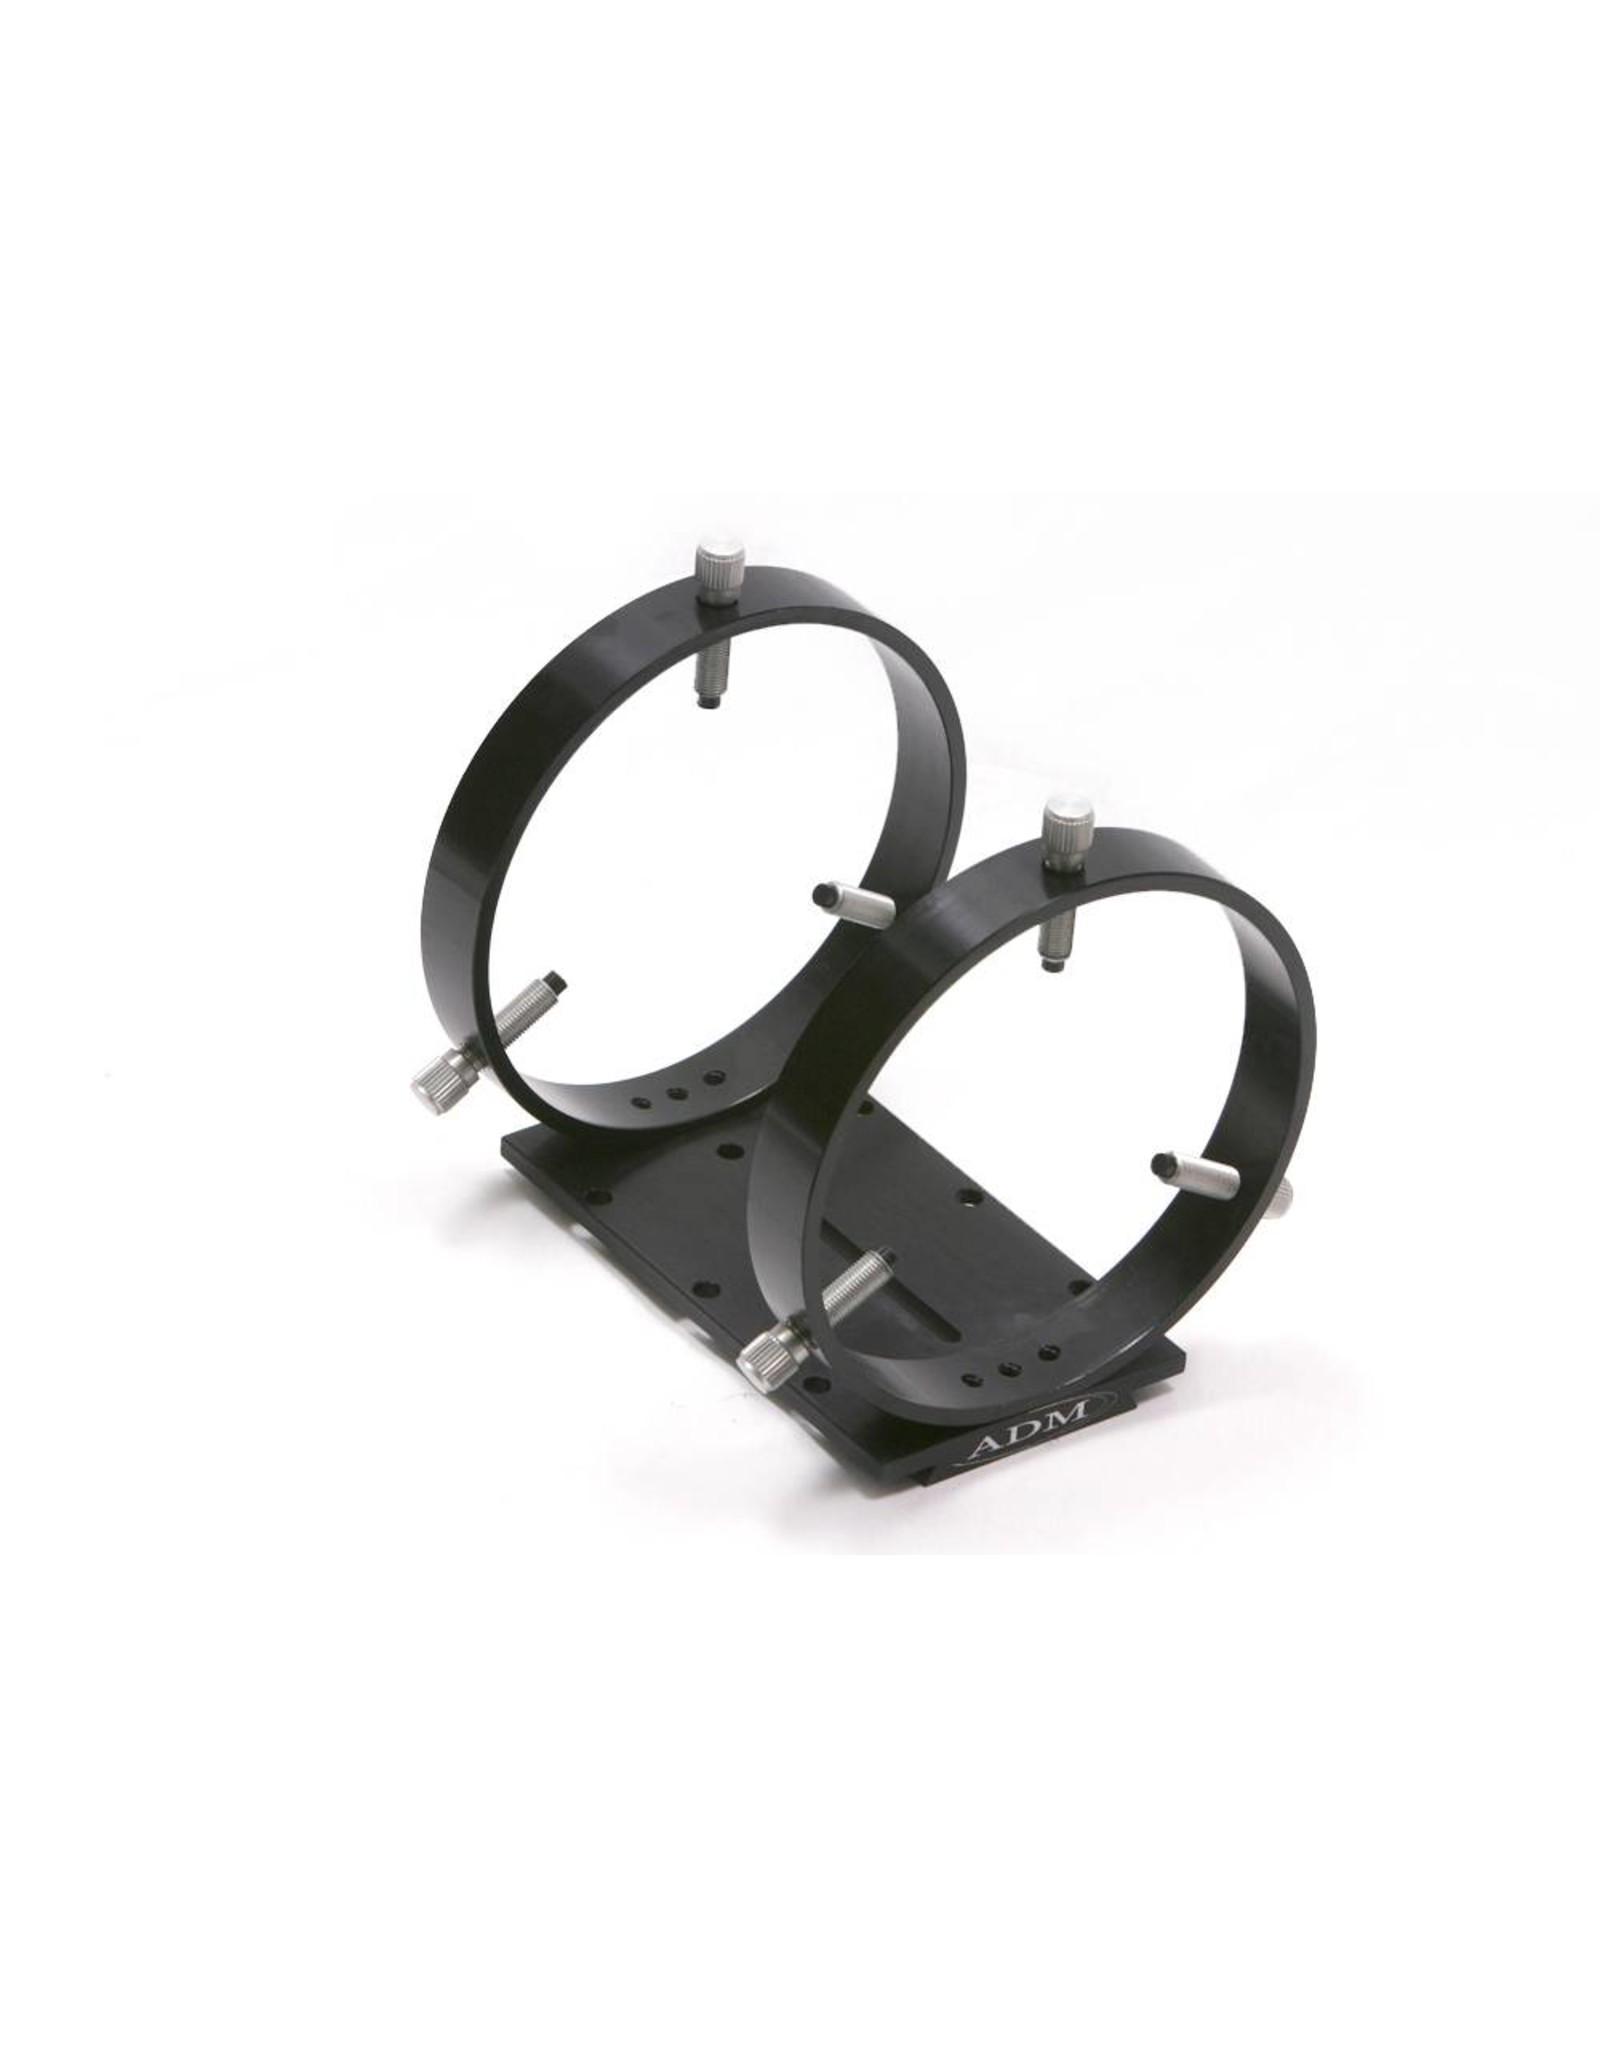 ADM ADM D Series Universal Ring Set